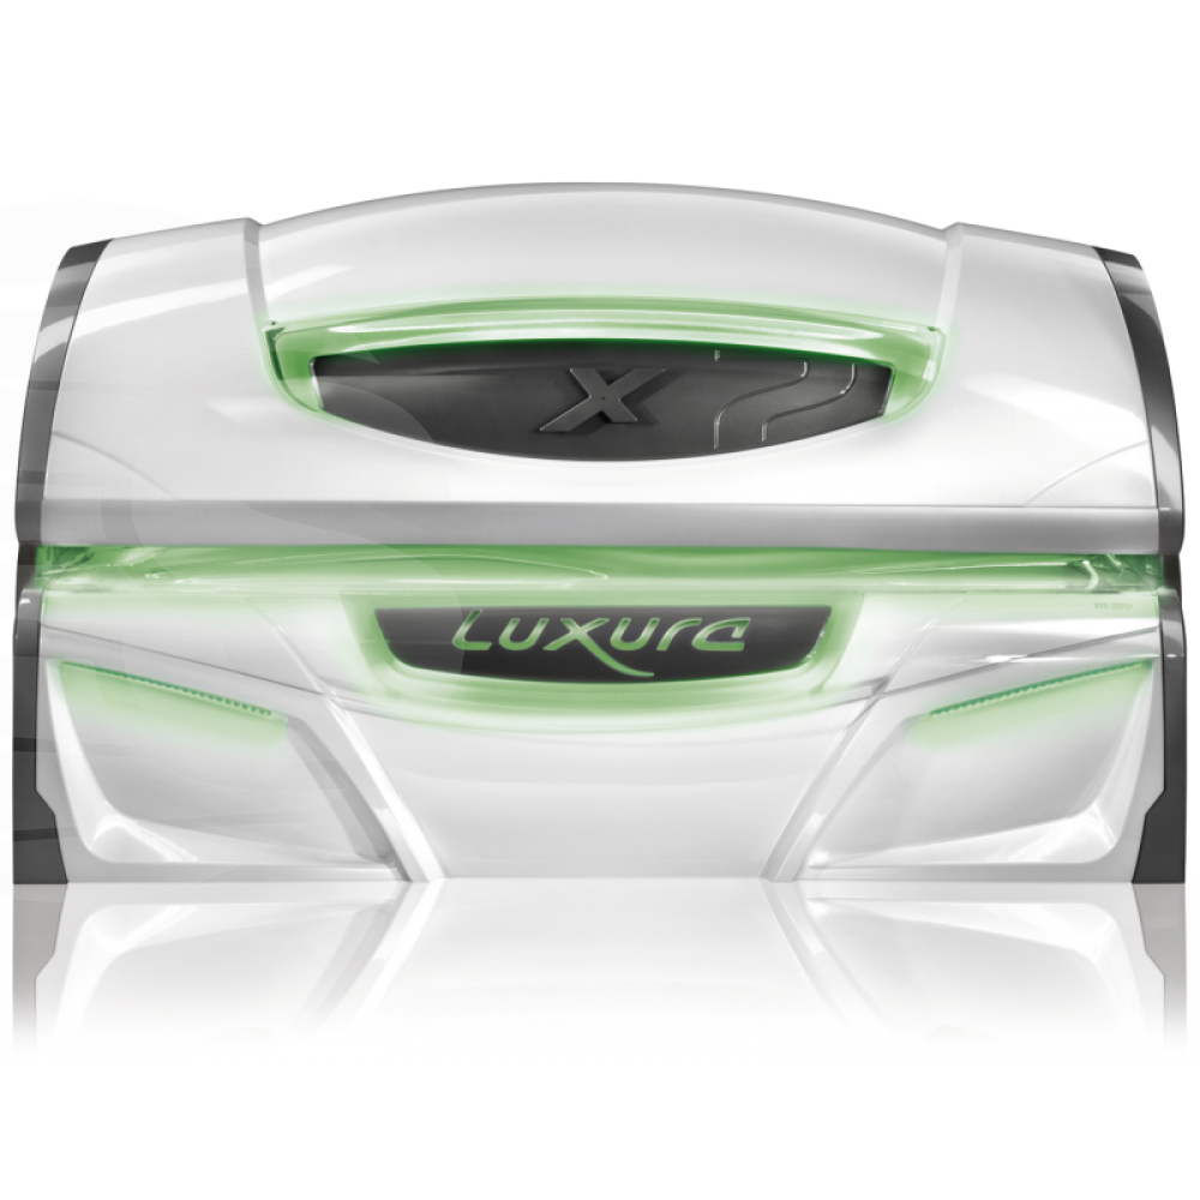 Hapro Luxura X7 38 SLI - Lettini Abbronzanti Luxura - Luxura